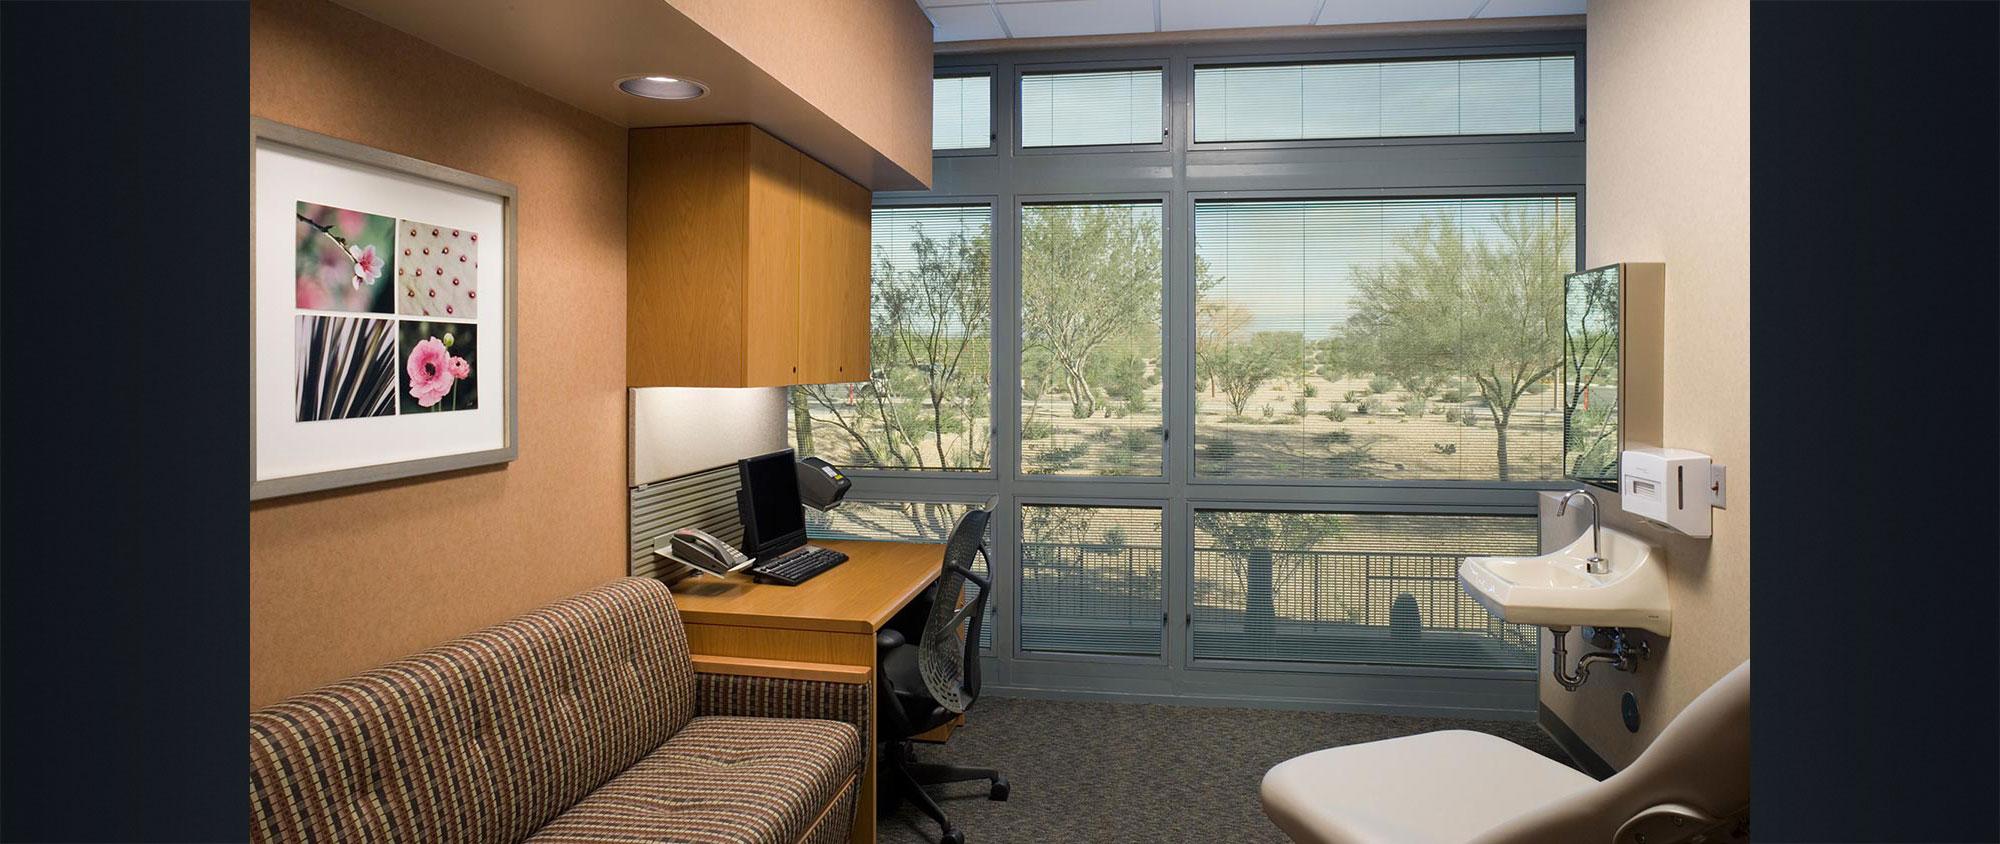 Mayo Clinic Hospital and Mayo Clinic Specialty Building